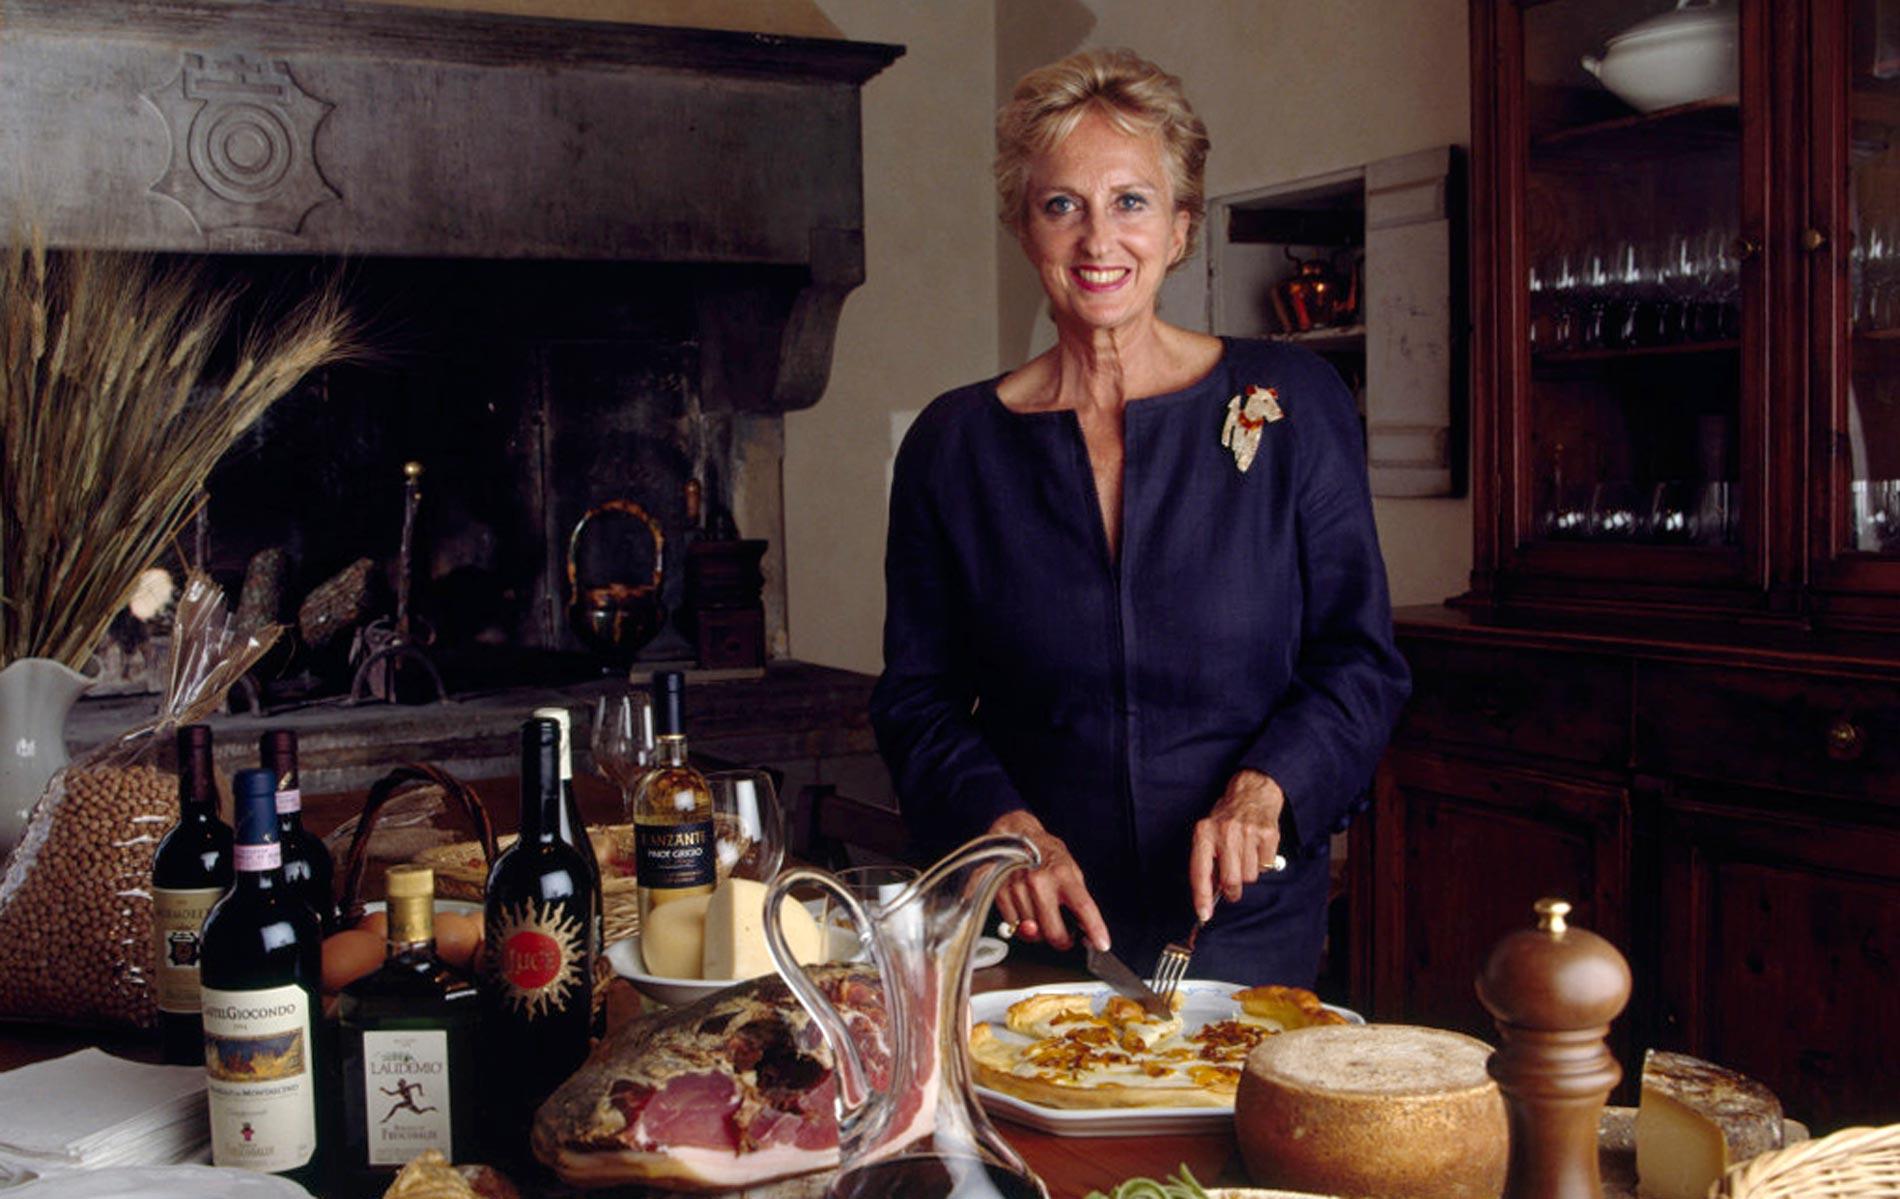 Donna BONA FRESCOBALDI - Winery Entrepreneur - Florence - Italy - © Graziano Villa